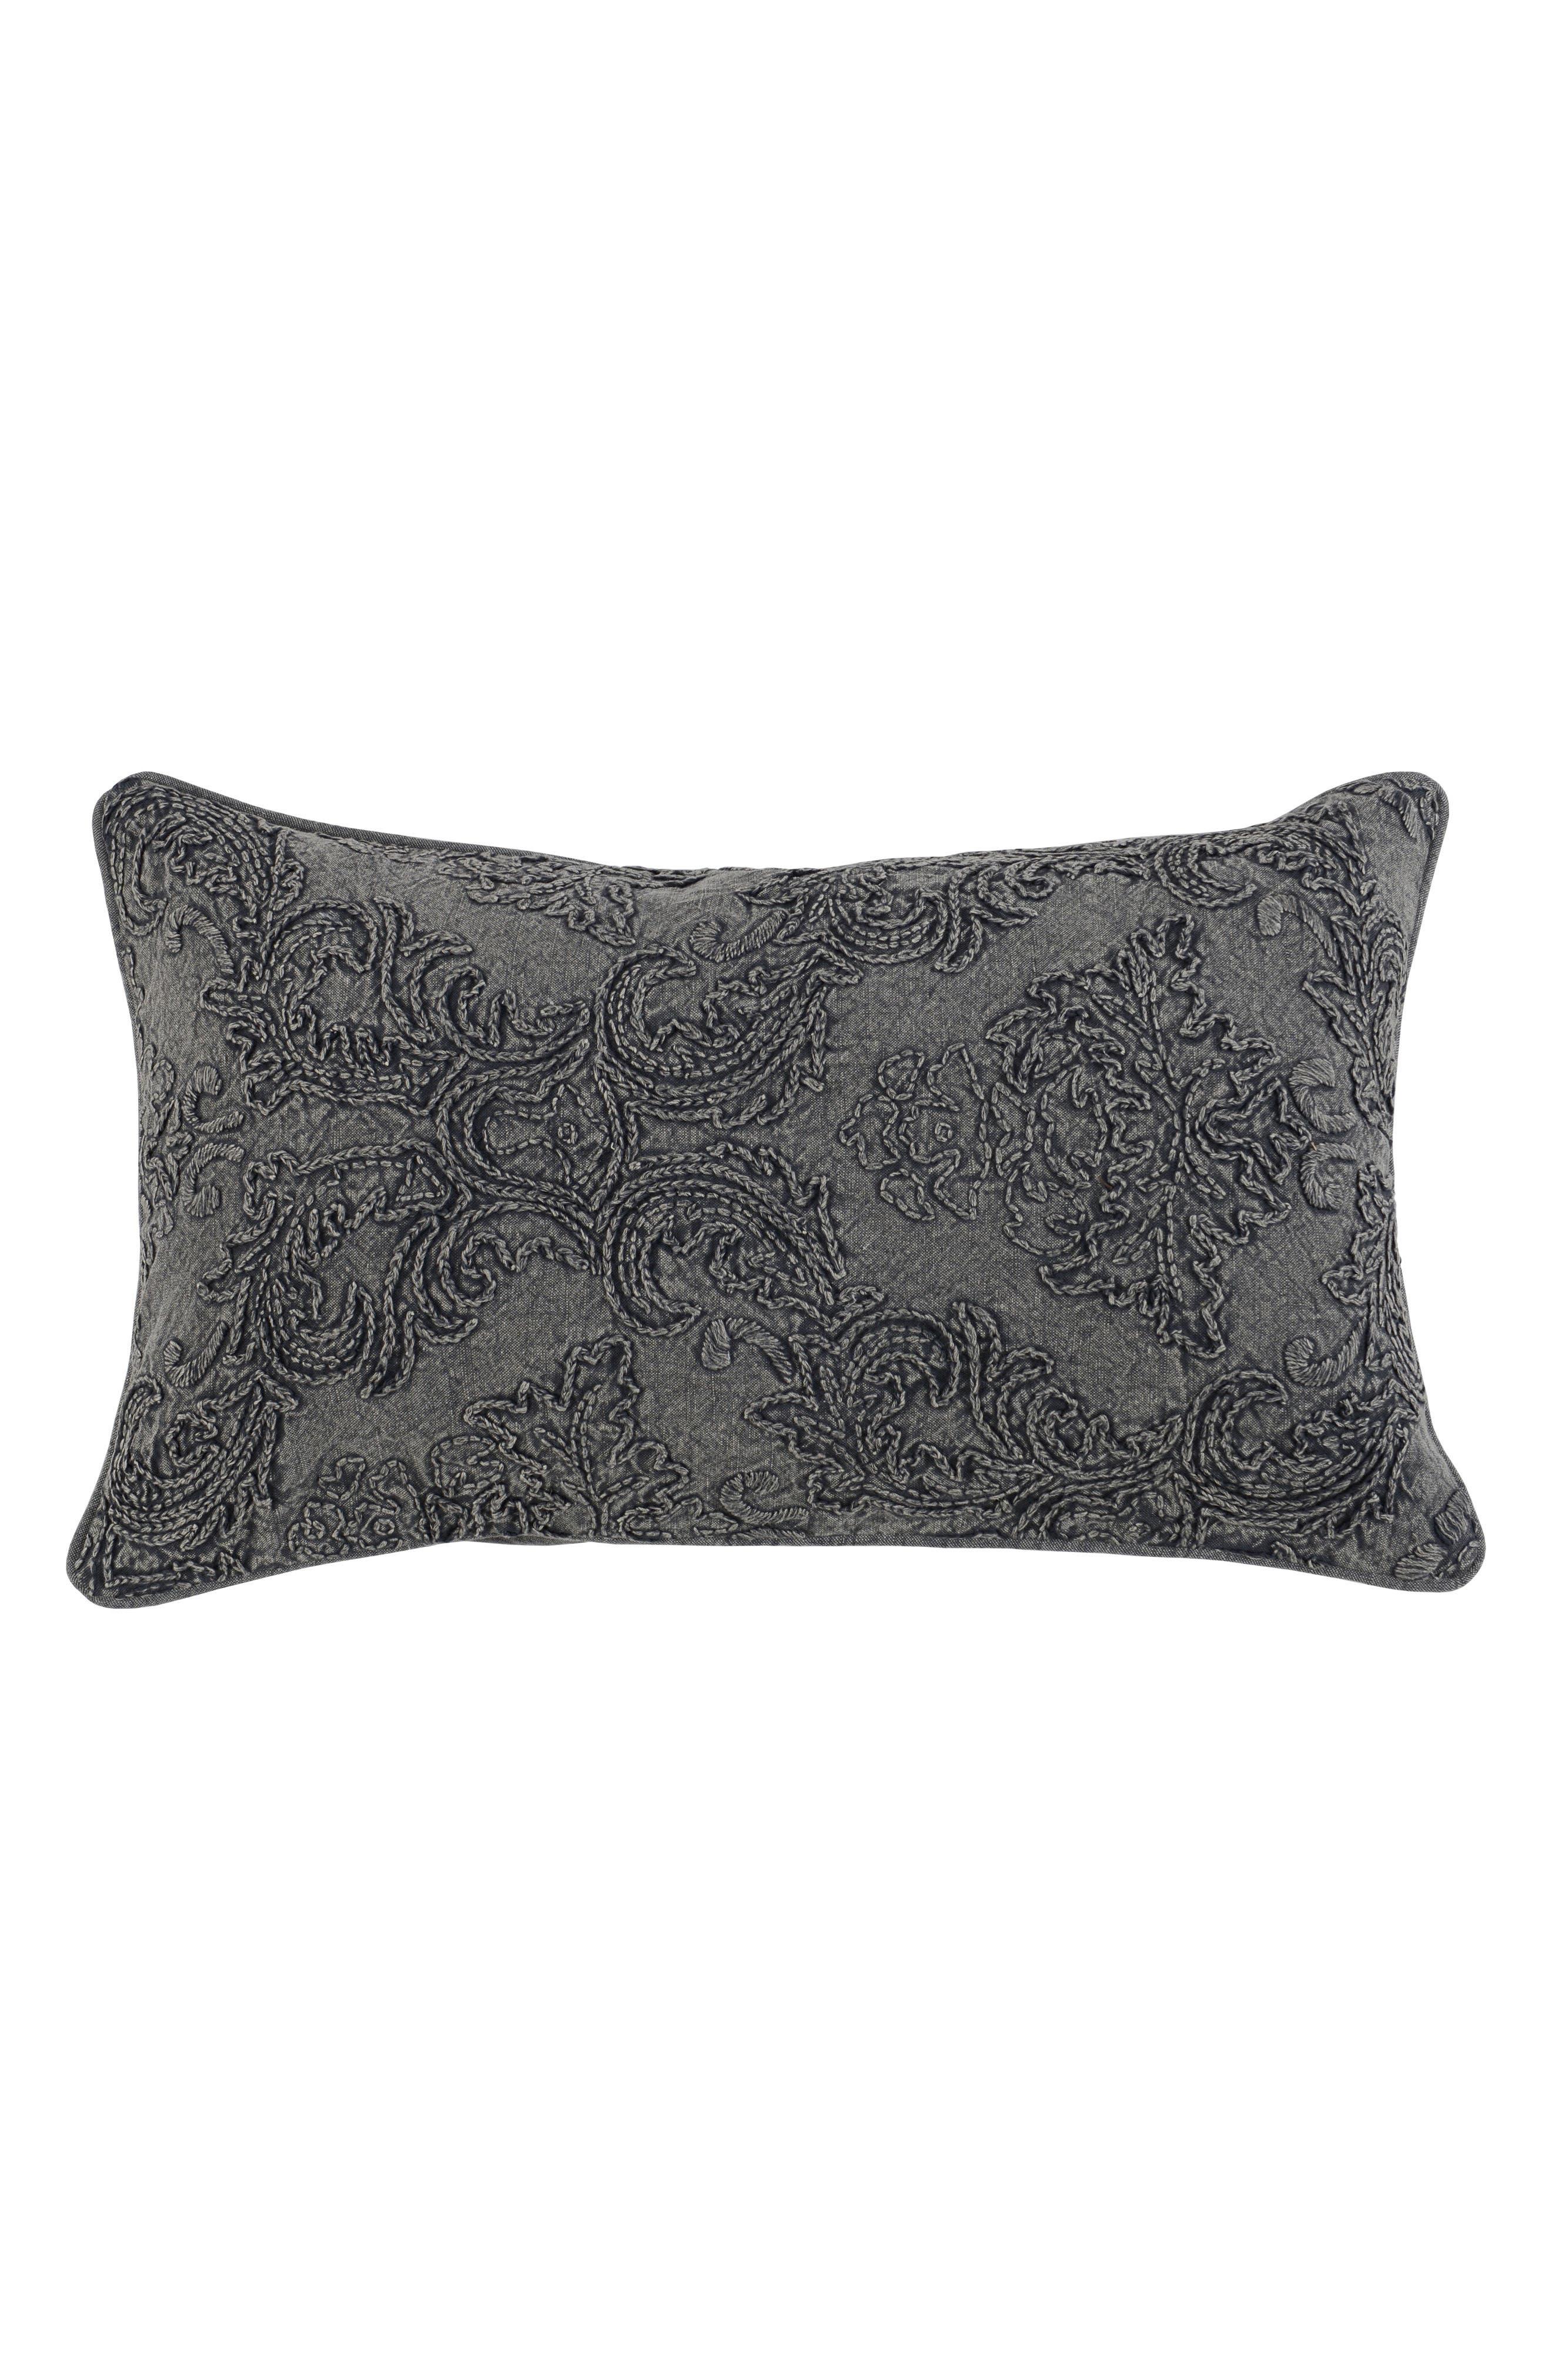 Perlita Linen Accent Pillow,                         Main,                         color, CHARCOAL